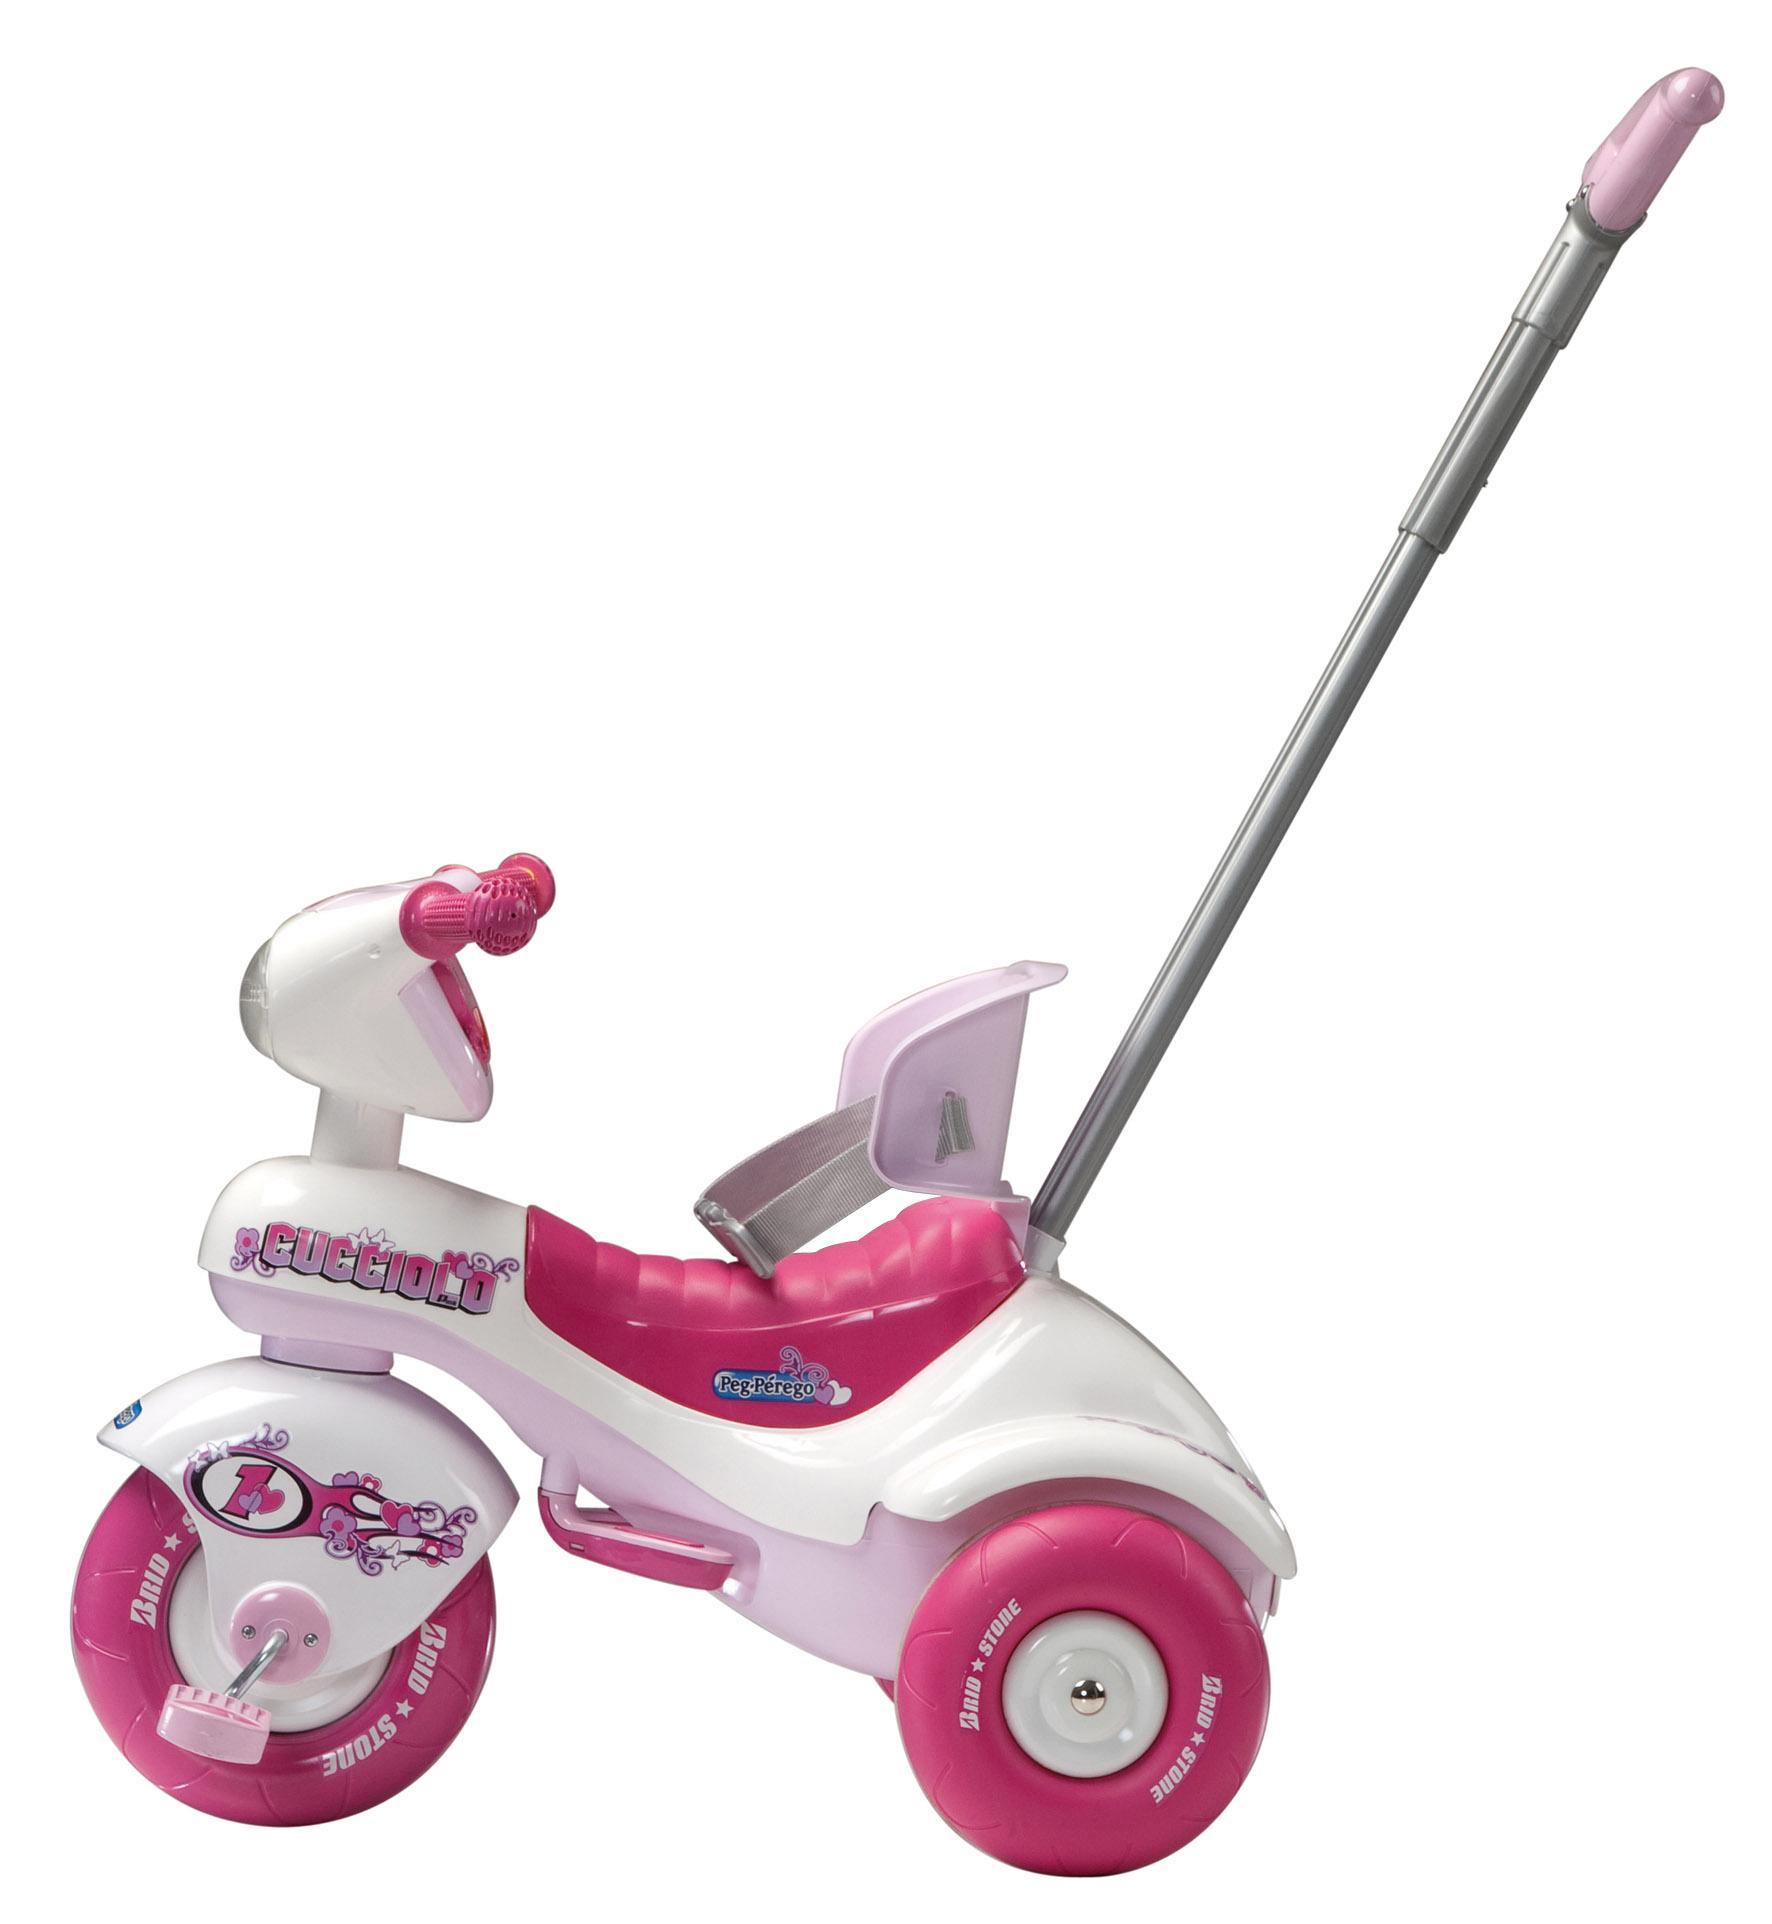 Peg-Perego Peg-Perego – Tricicleta Cucciolo